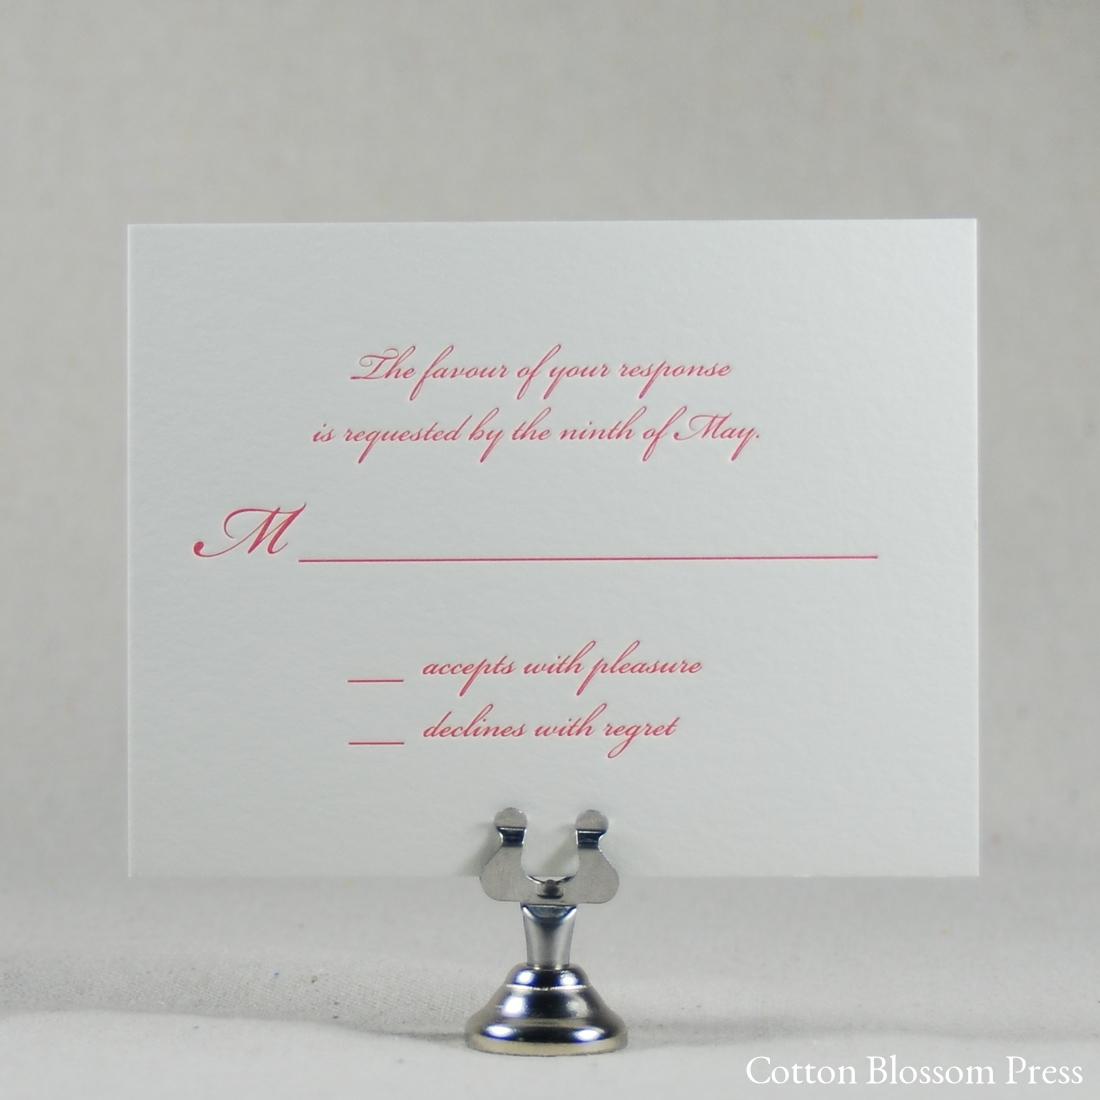 CBP-Wedding_Ihla_Reply.JPG